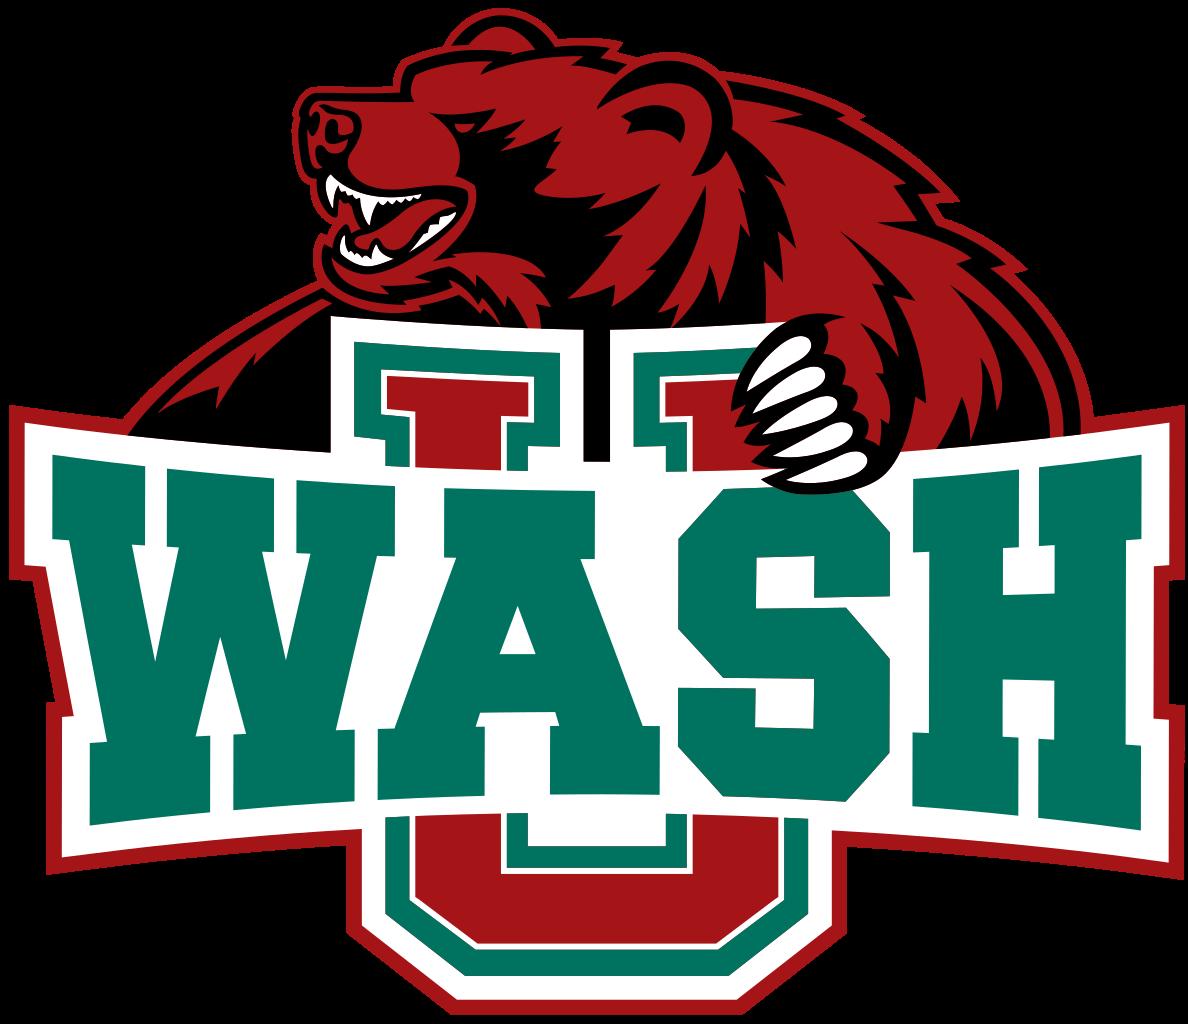 Wustl logos filewashington bears. Husky clipart washington university